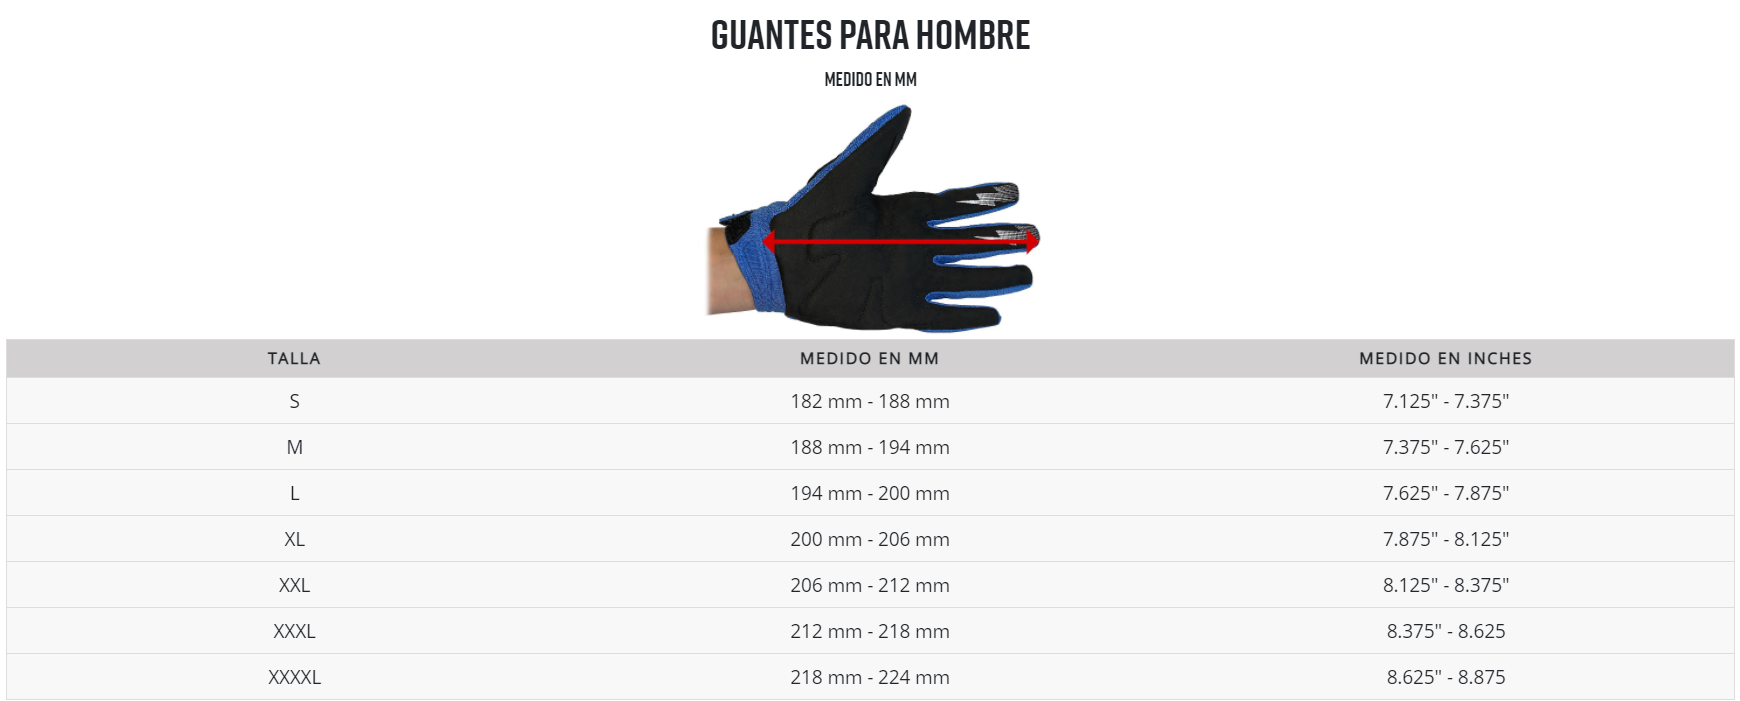 fox guantes medidas